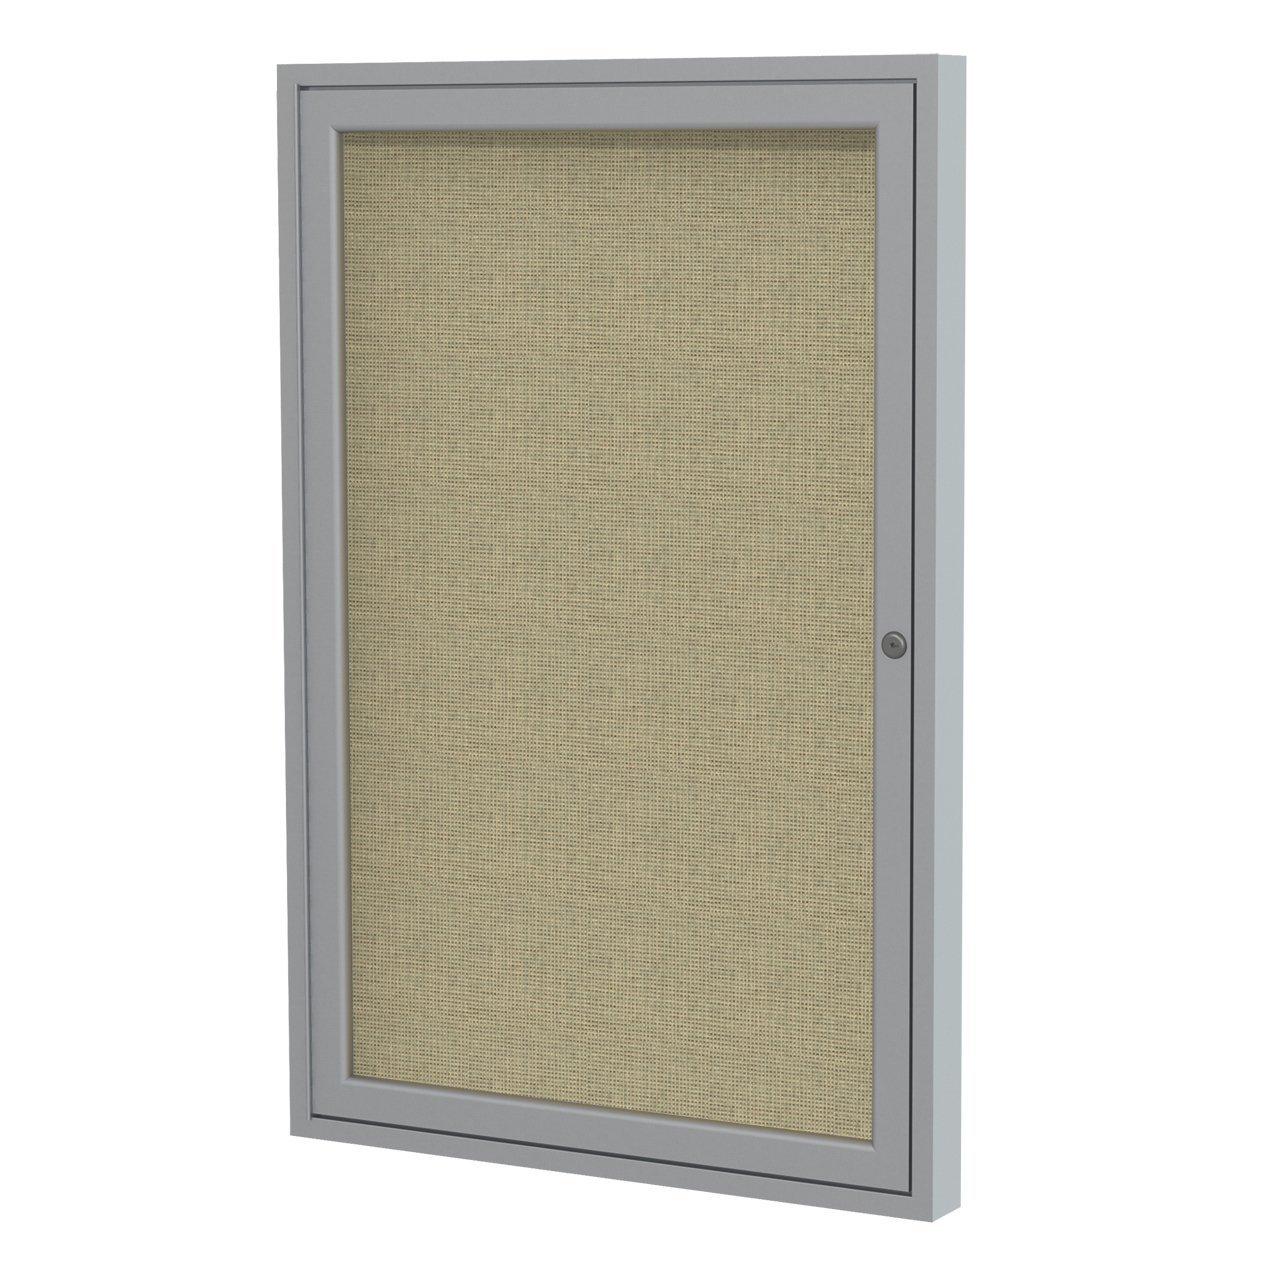 "Ghent 2"" x 1 1/2"" Satin Aluminum Frame Enclosed Fabric Bulletin Board, Beige (PA121 1/2F-90)"